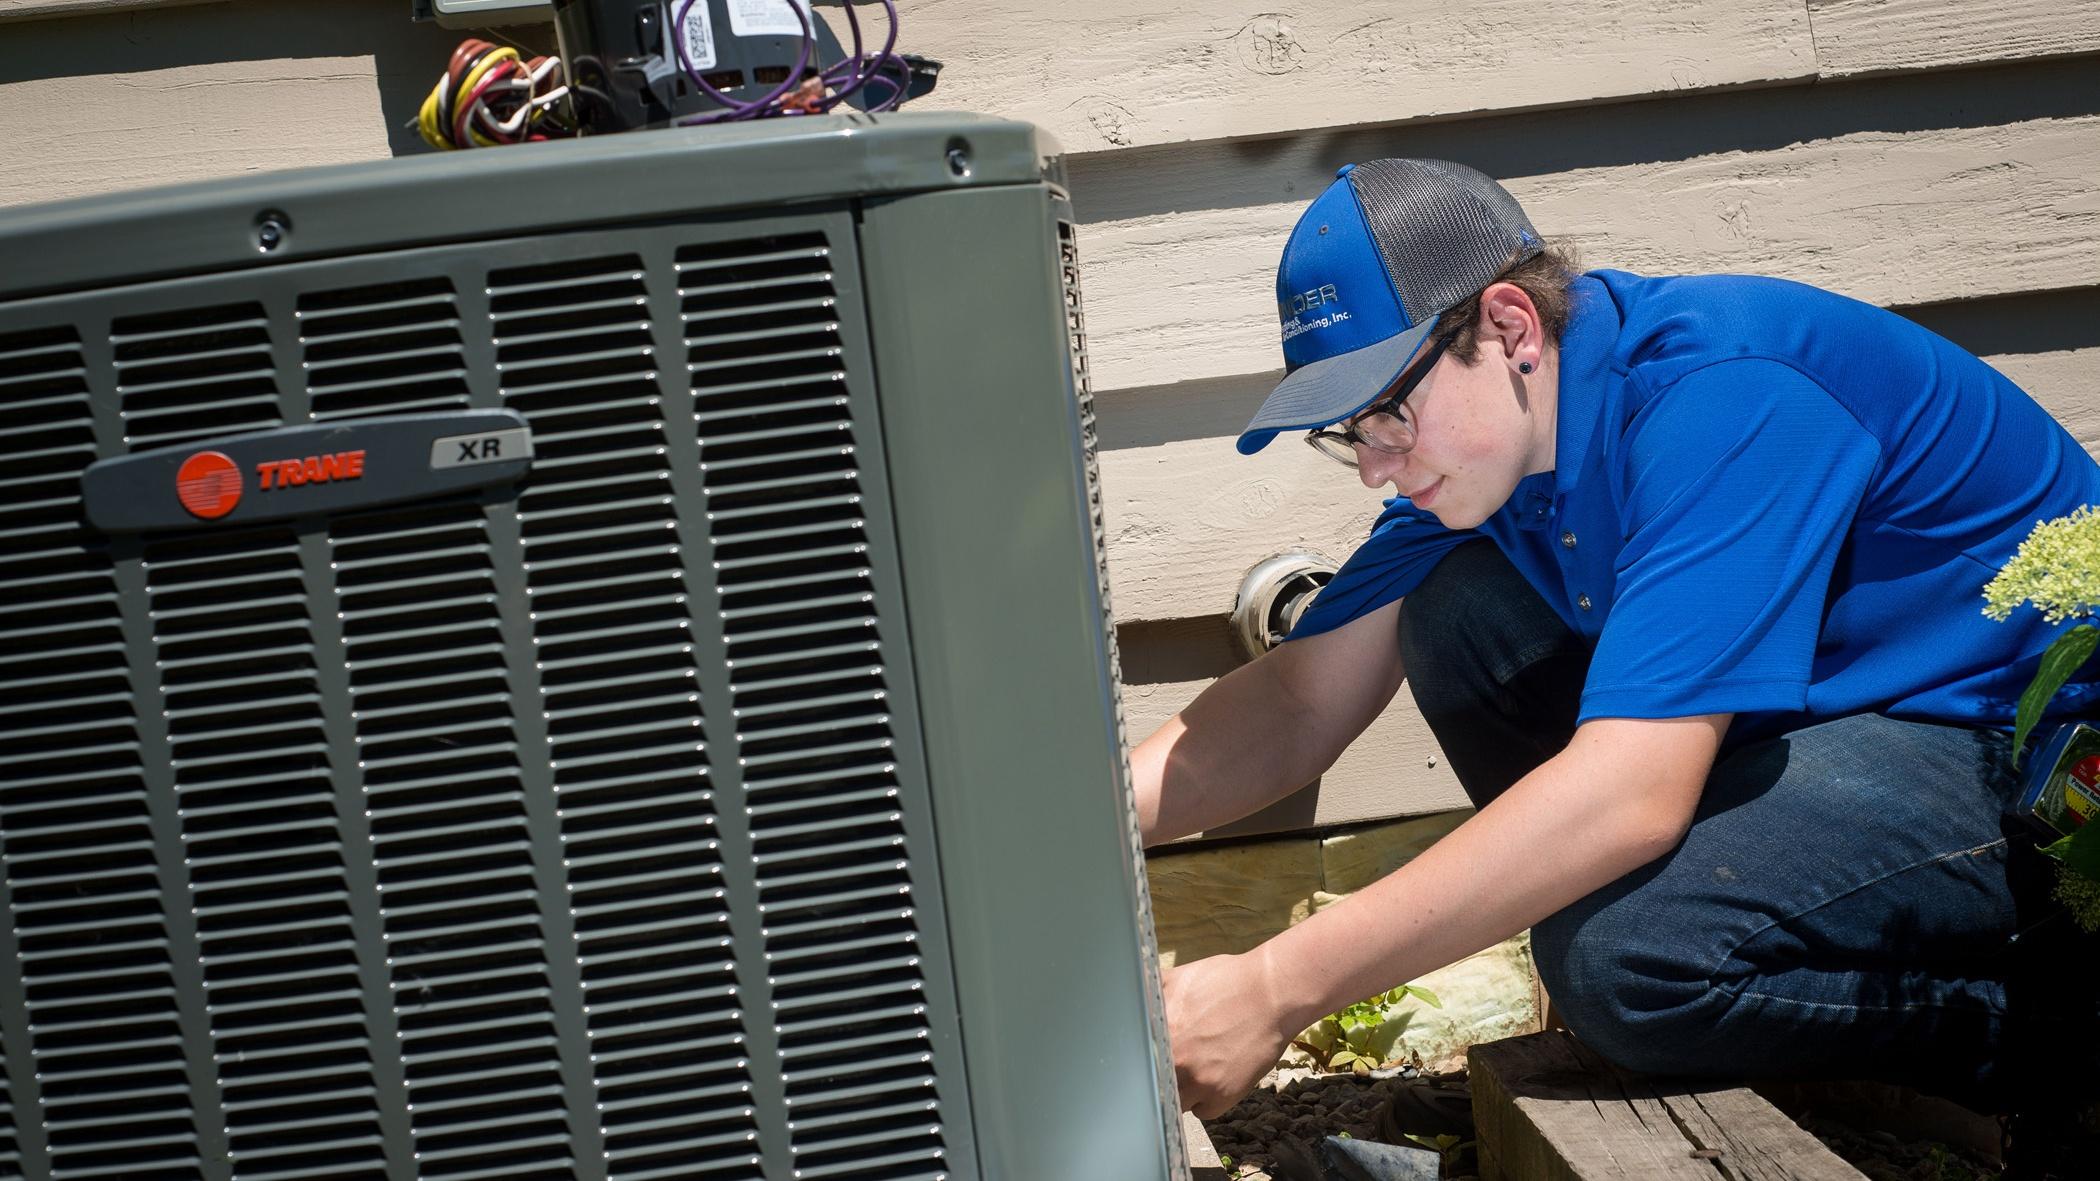 binder-air-conditioning-repair-installation.jpg